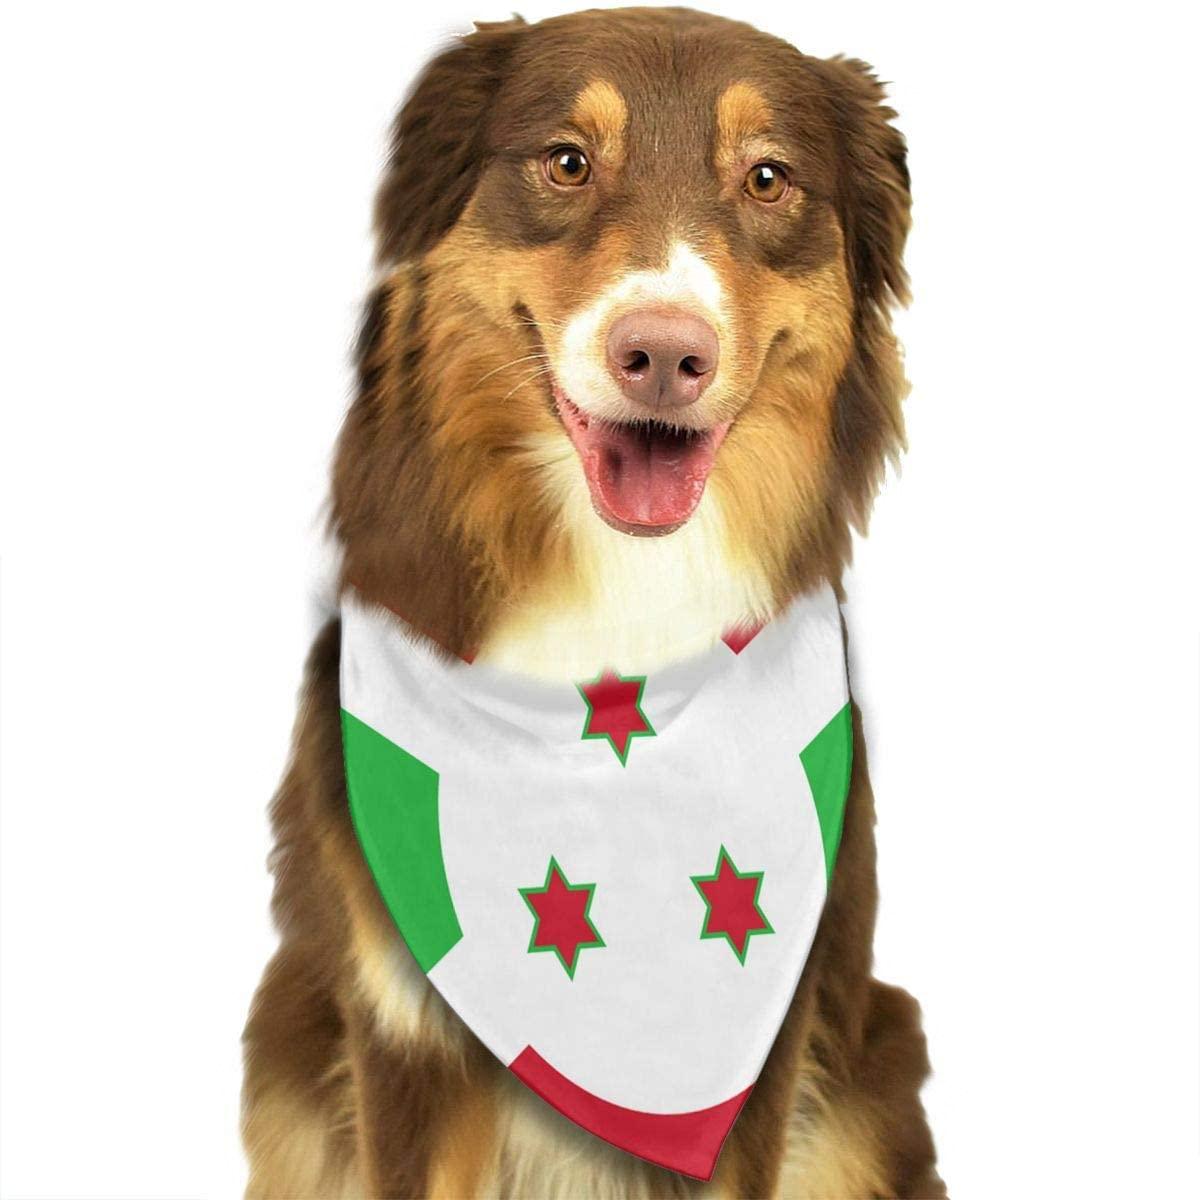 CHAN03 Dogs Bandana Collars Flag of Burundi Pets Triangle Neckerchief Puppy Bibs Scarfs Cats Scarfs Towel